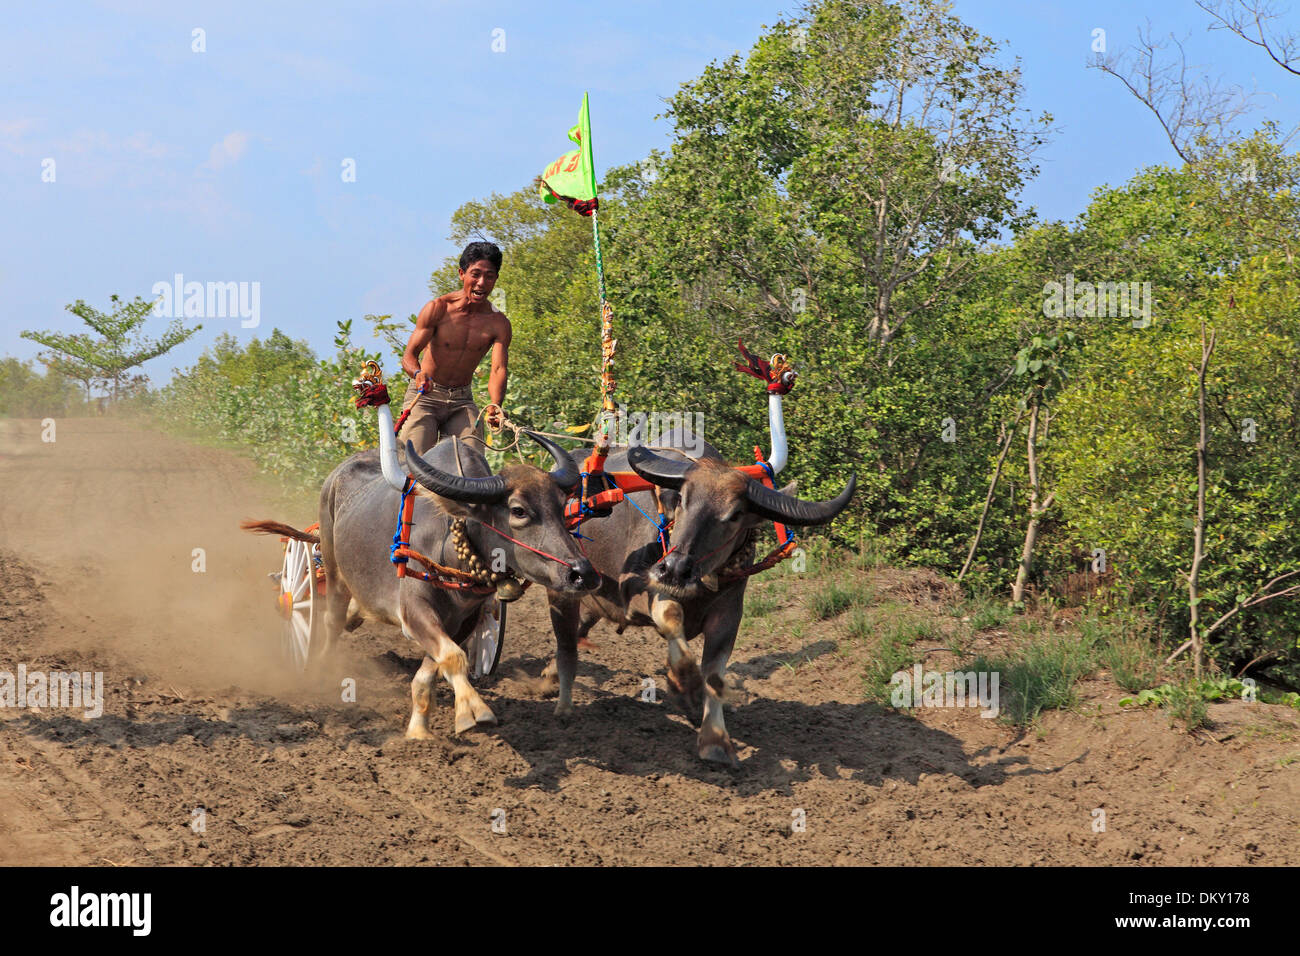 traditional-racing-of-bull-water-buffalo-negara-west-bali-indonesia-DKY178.jpg